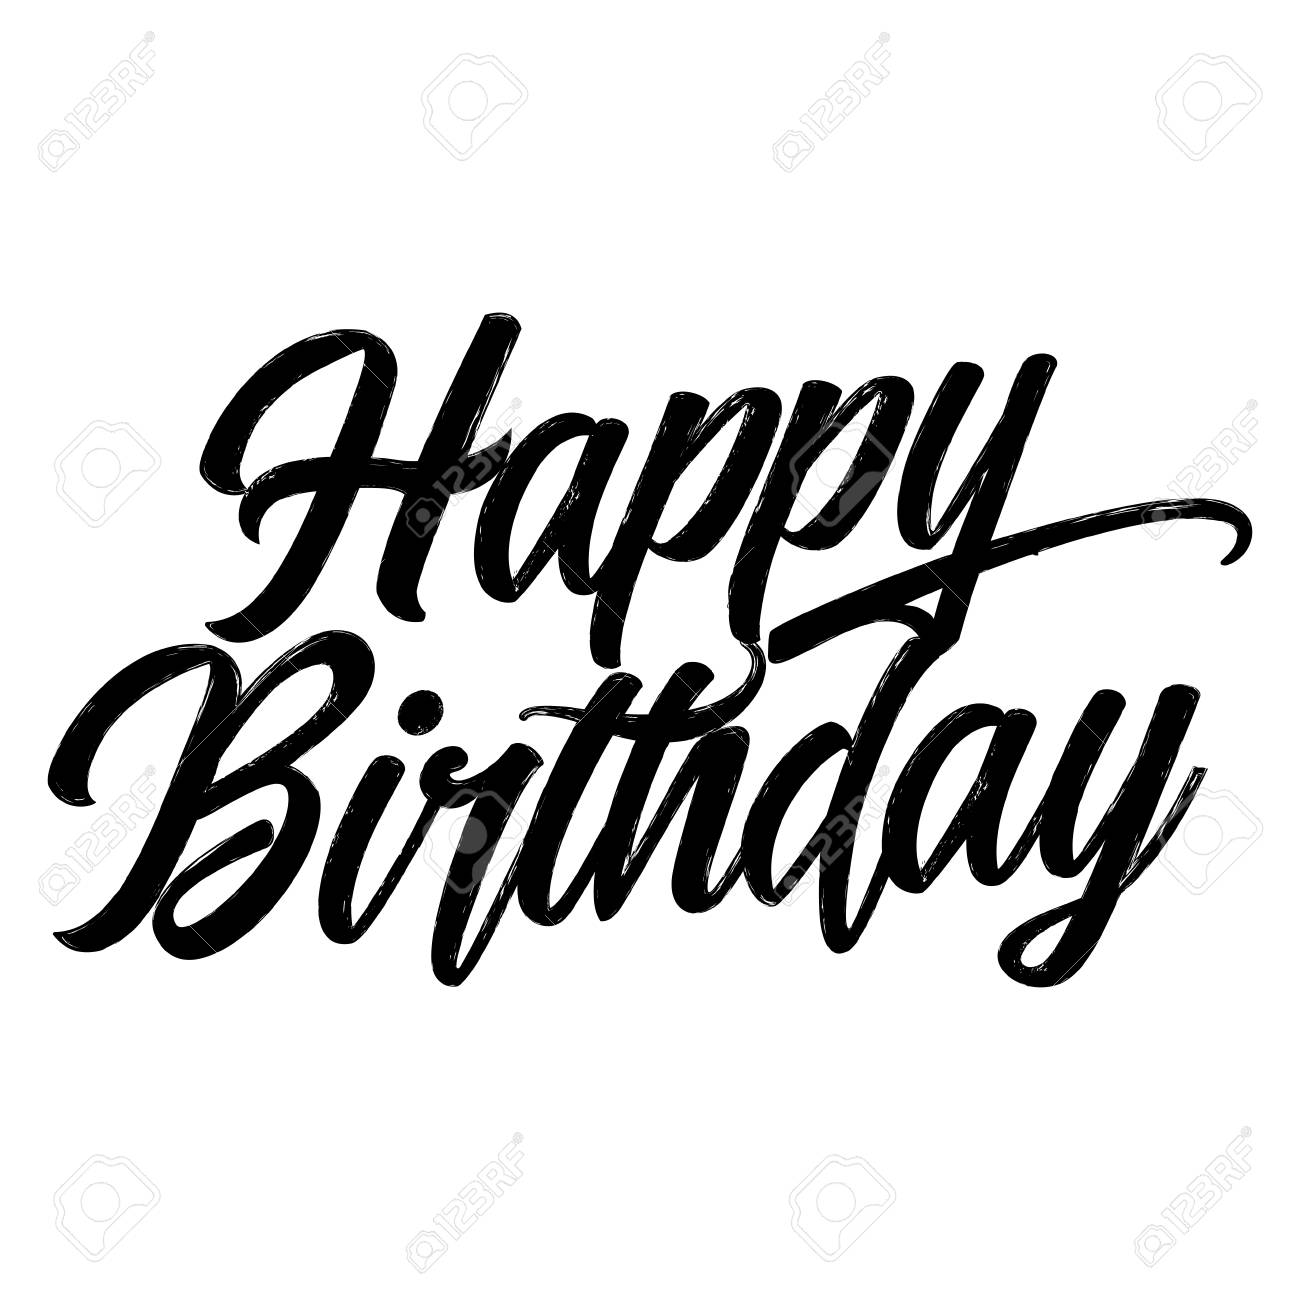 Happy Birthday Hand Drawn Typography Poster Conceptual Handwritten